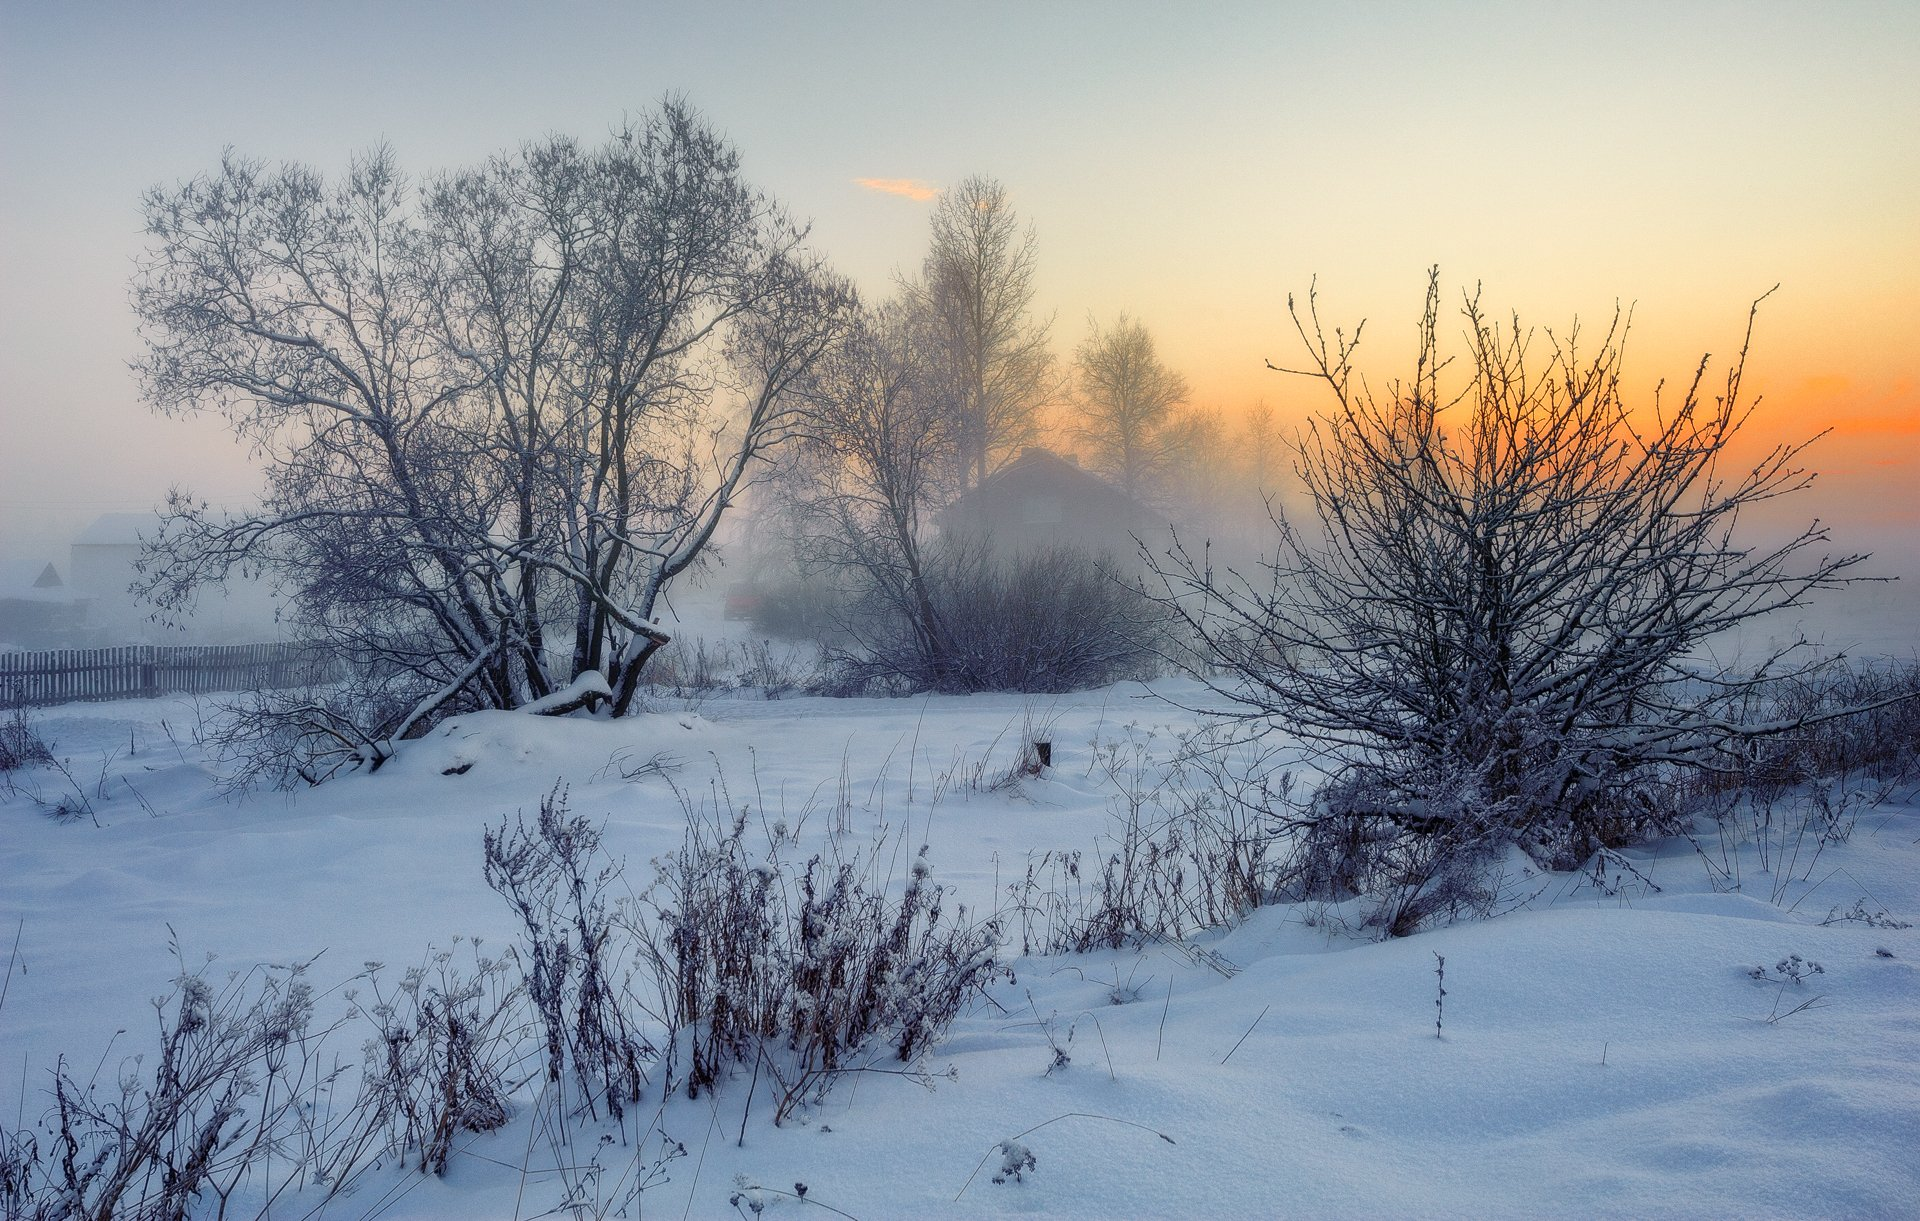 зима,вечер,туман,сумерки,снег,пейзаж, Евгений Плетнев